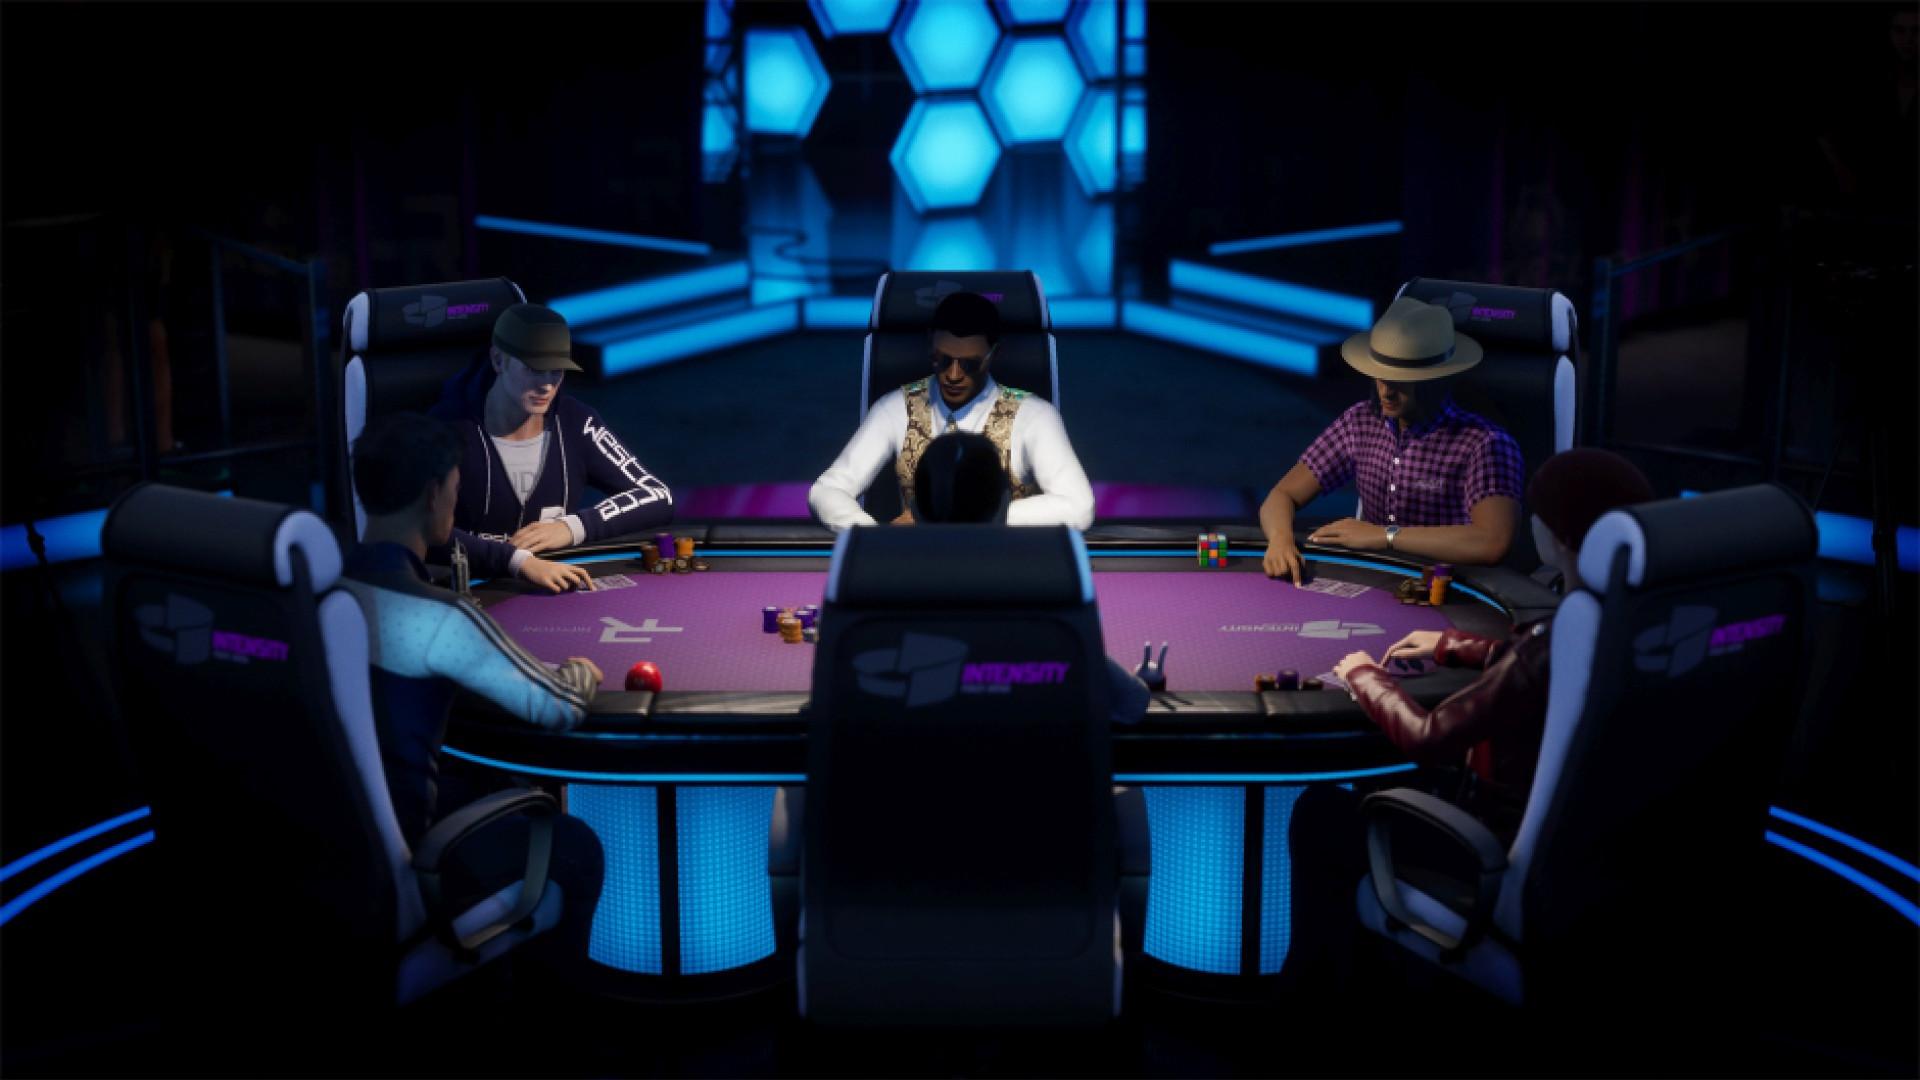 poker club hd wallpaper 72504